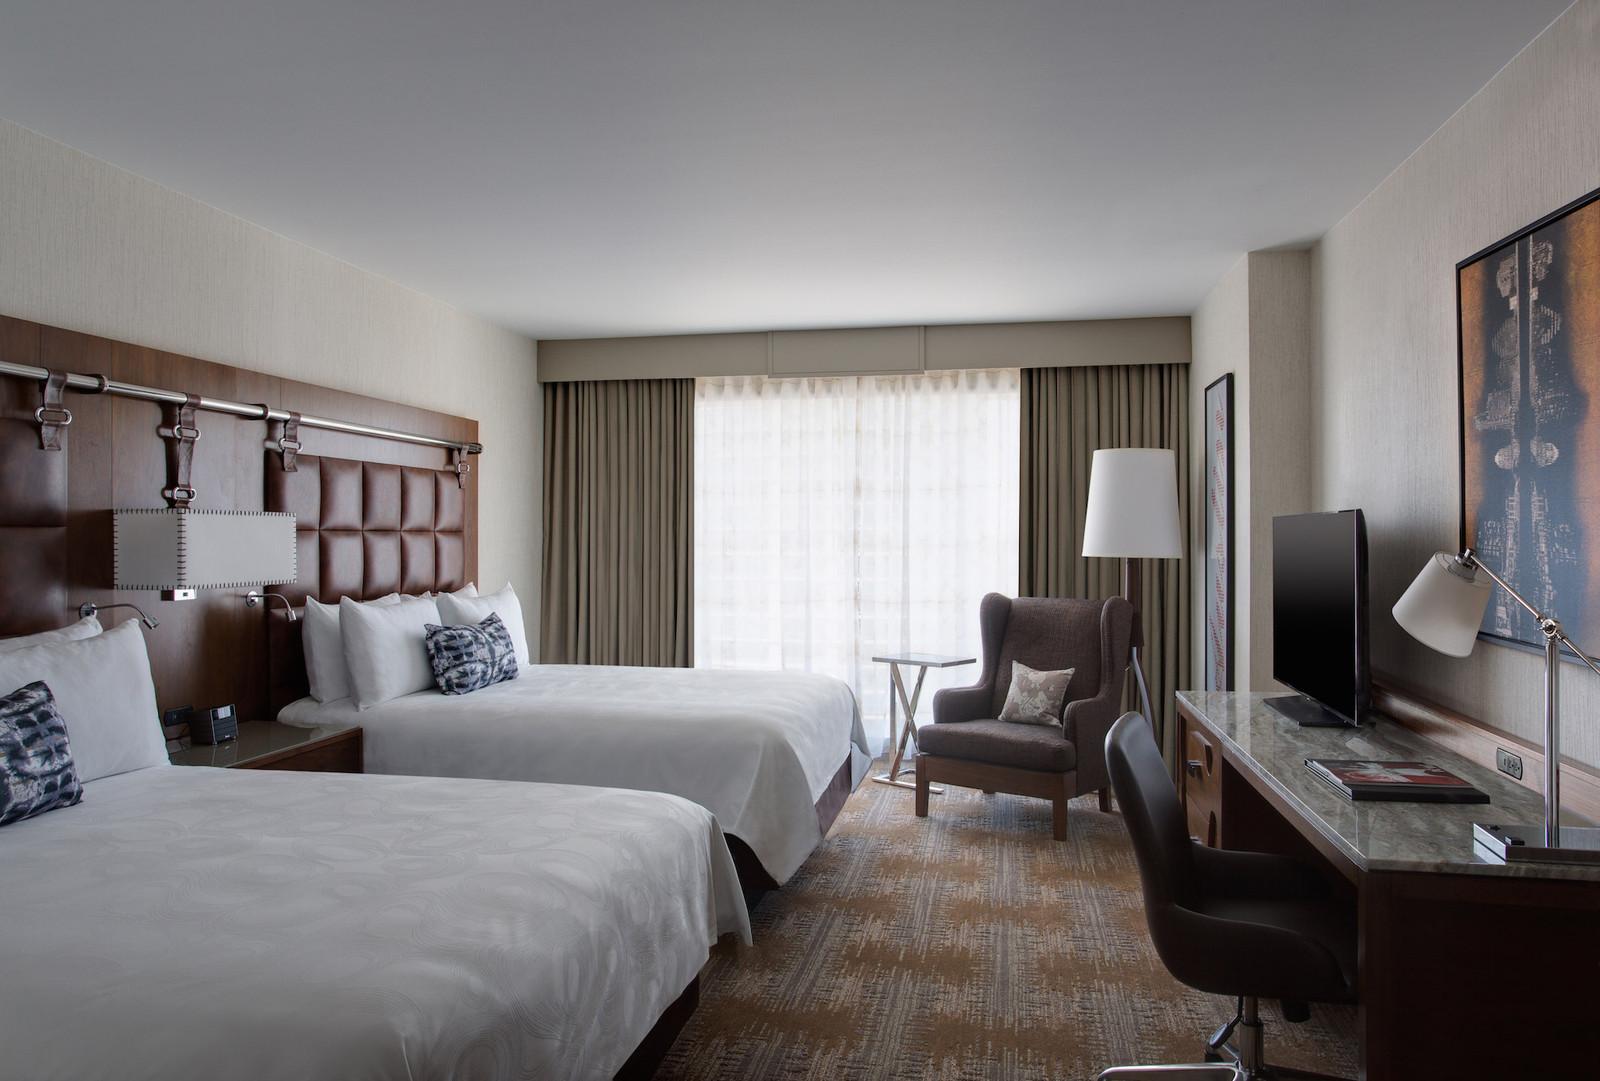 Pre Assembled Bedroom Furniture Turn Key Hotel Banquet Serviced Apartment Furniture Bedroom